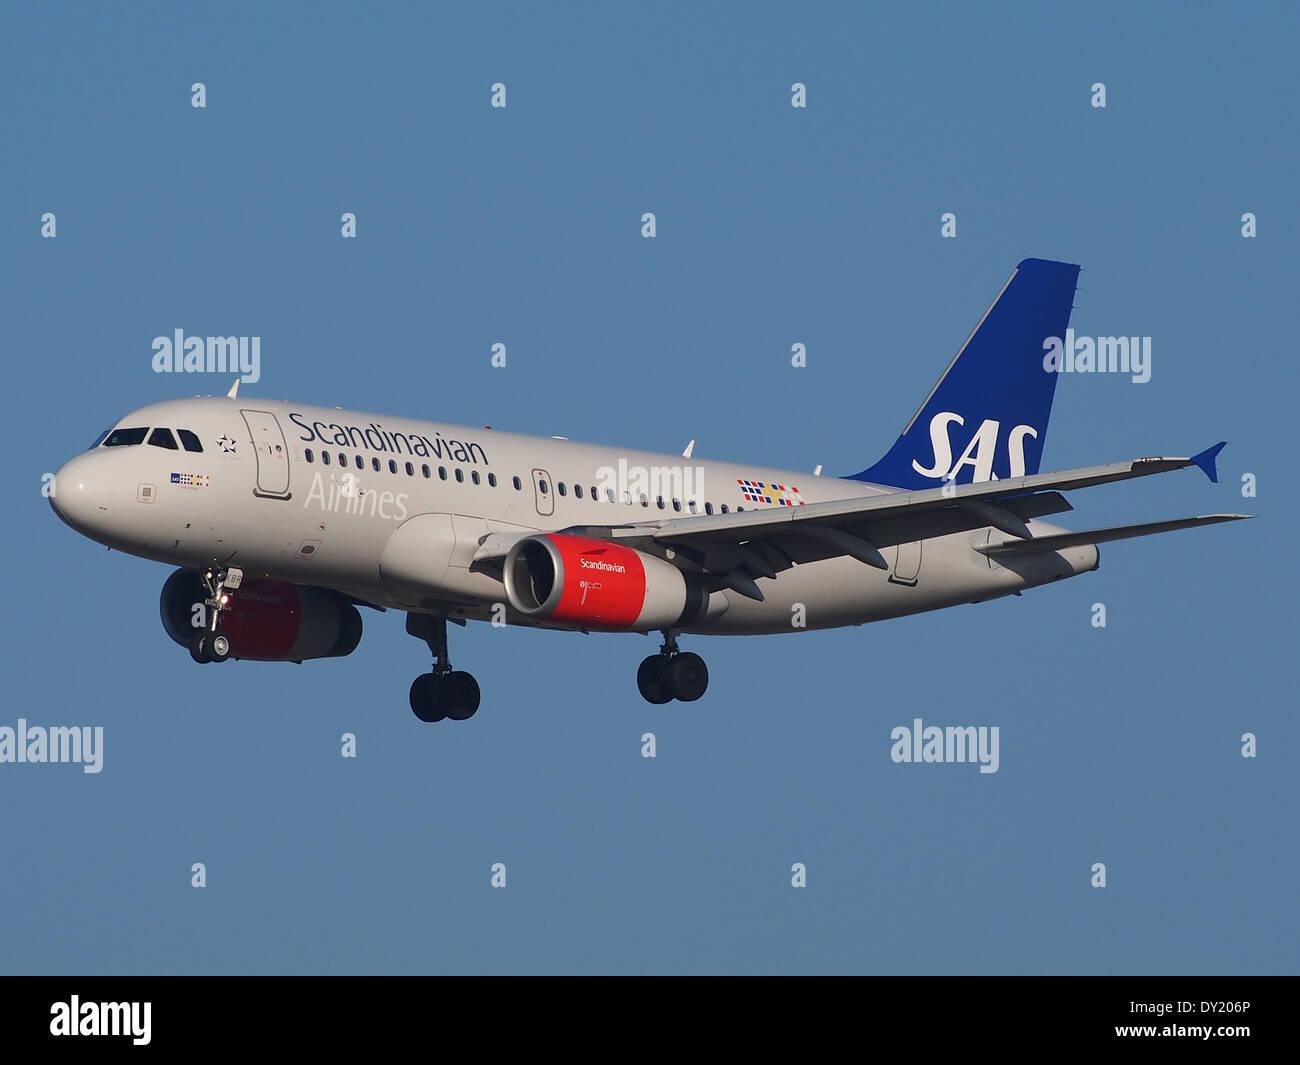 OY-KBR SAS Scandinavian Airlines Airbus A319-131, l'atterrissage sur Schiphol, pic-1 Photo Stock